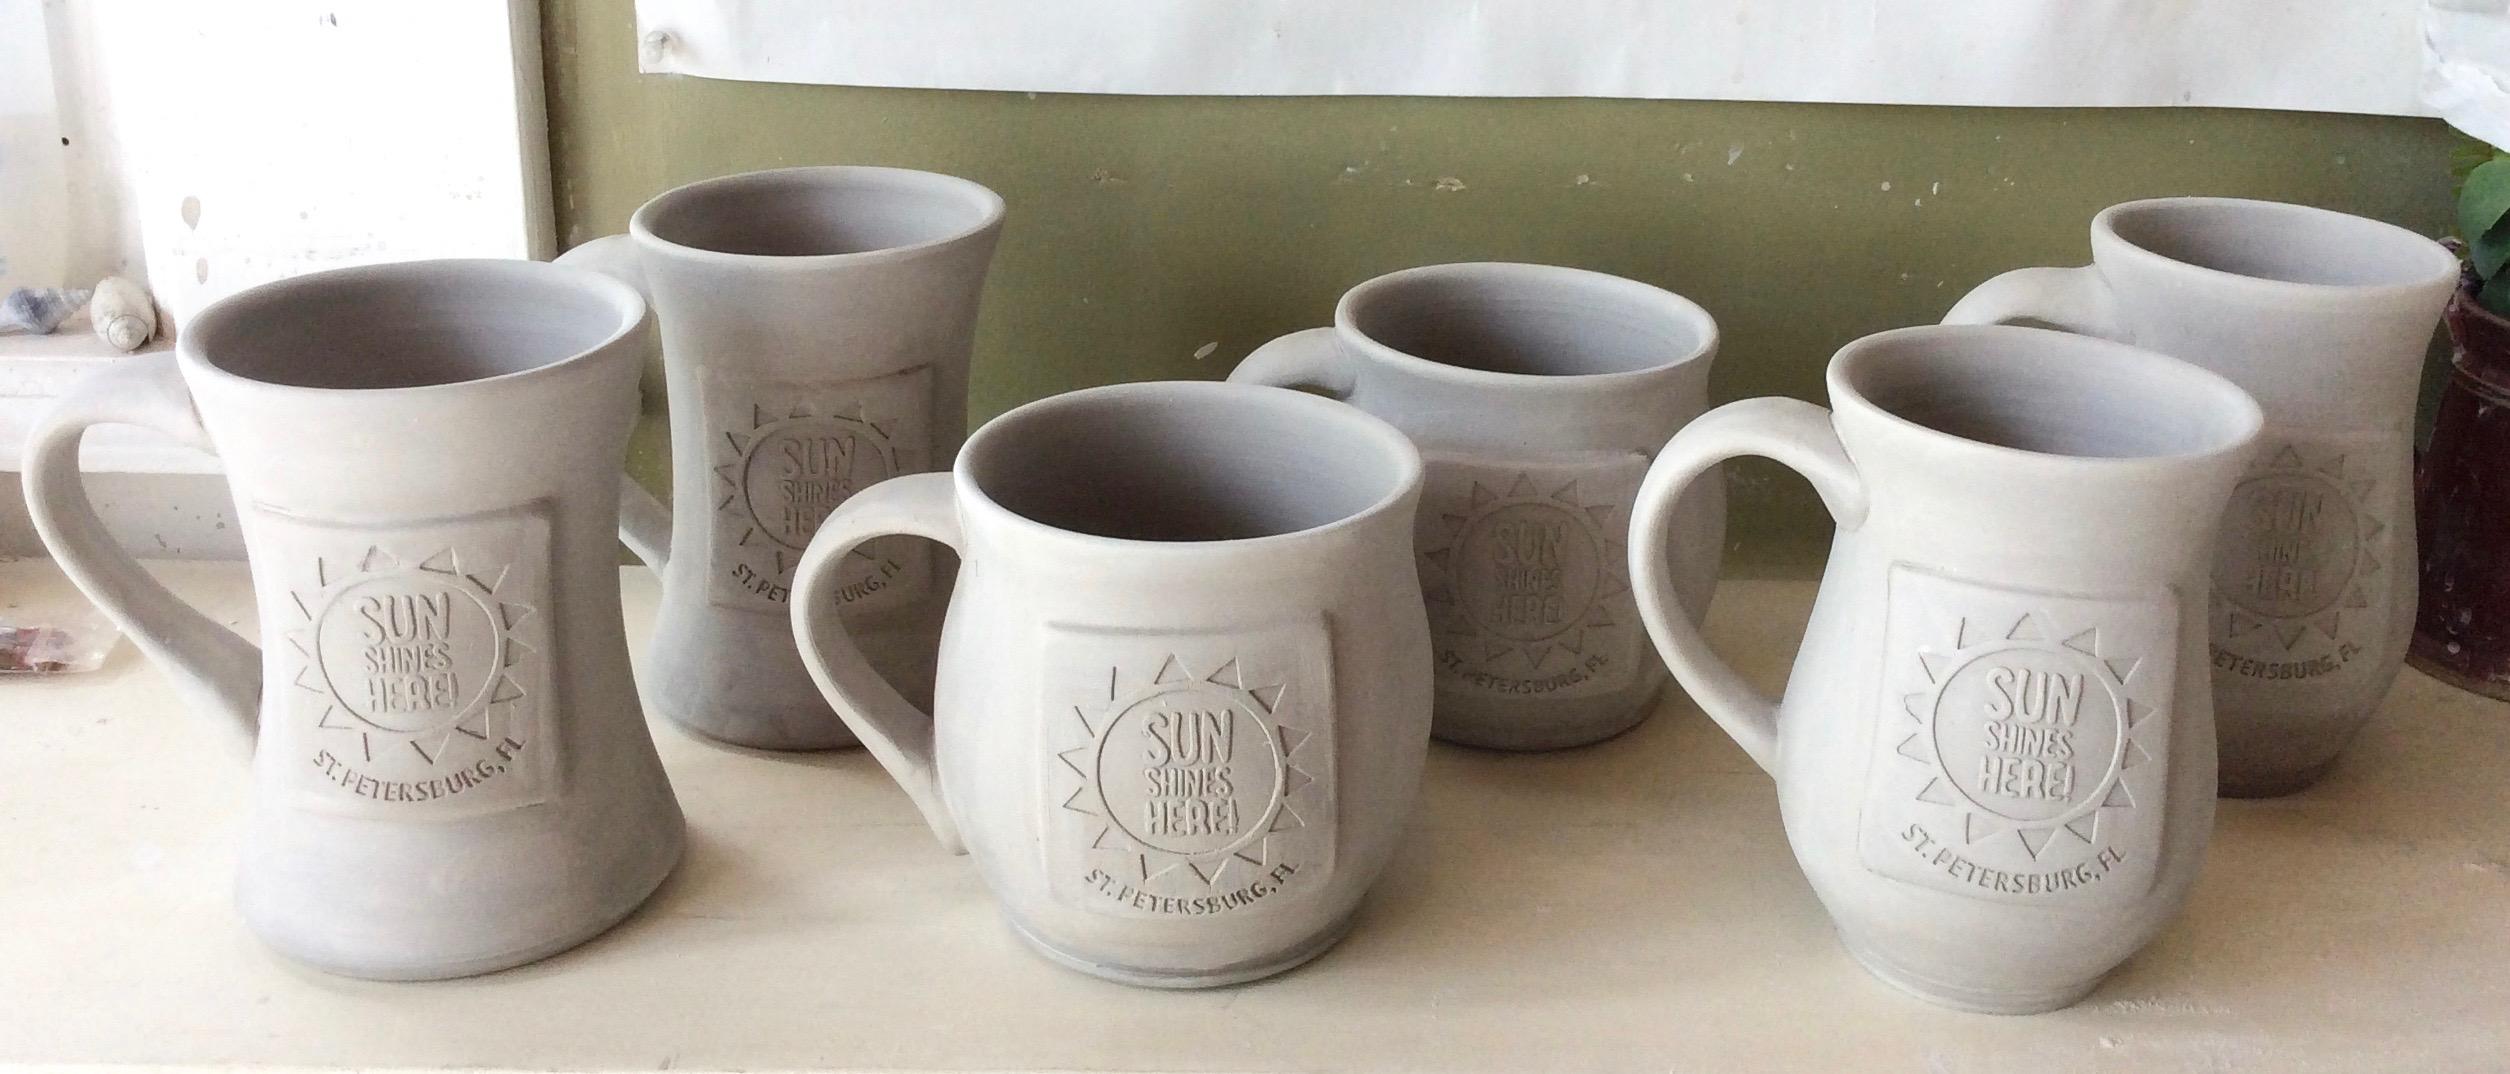 Greenware Mugs